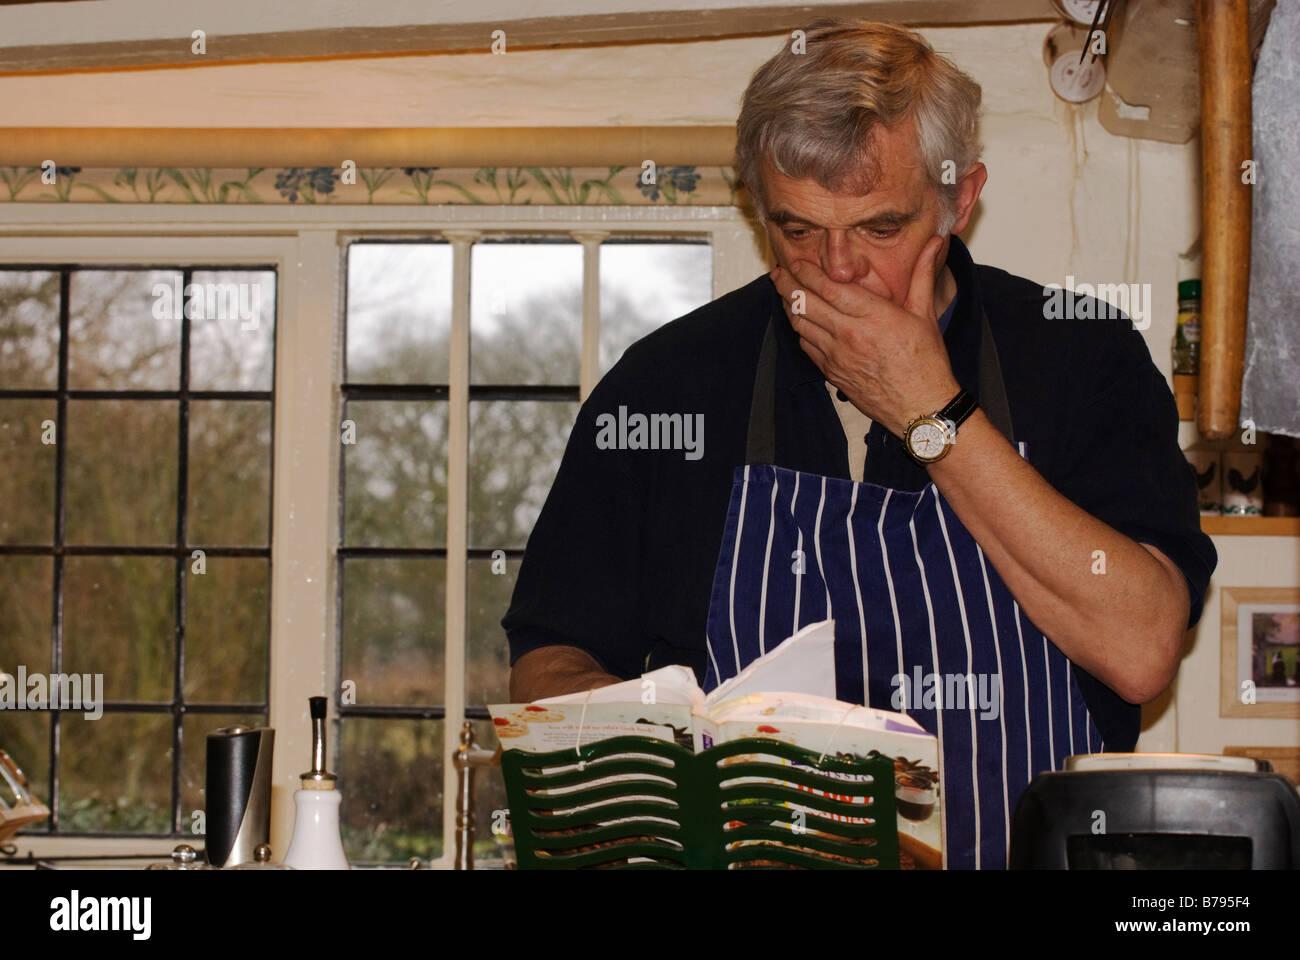 man deliberating over recipe book - Stock Image